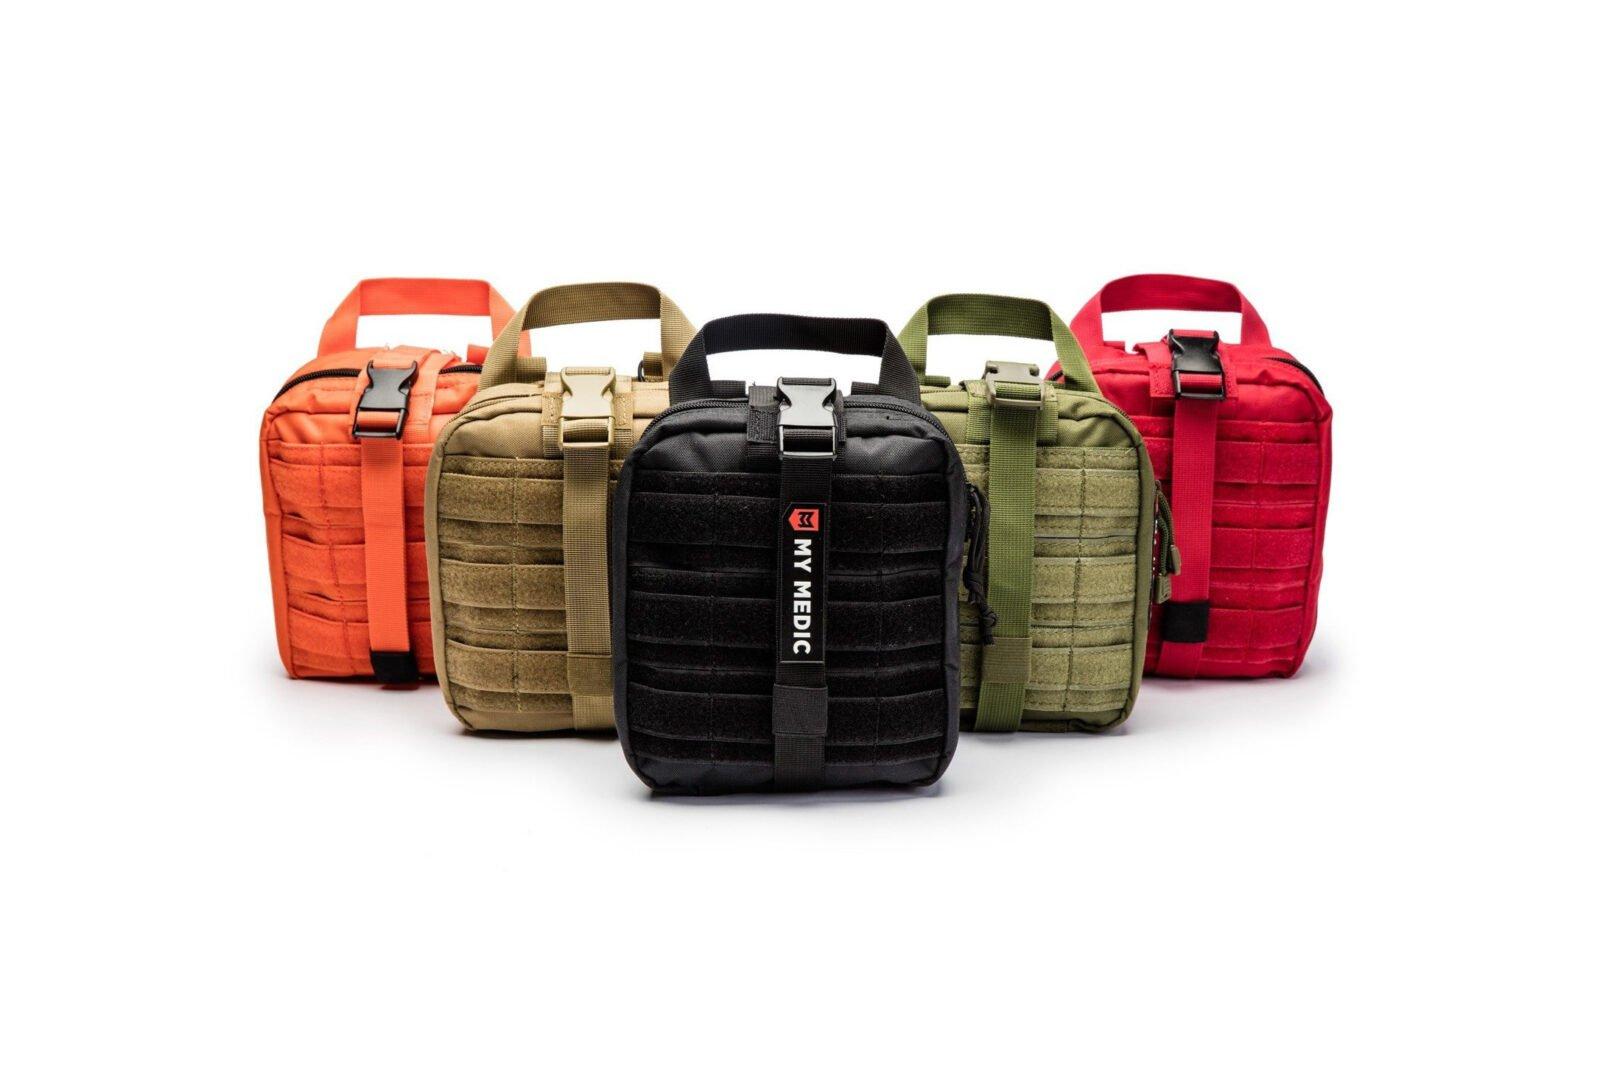 My Medic First Aid Kit 1600x1085 - My Medic - First Aid Kit